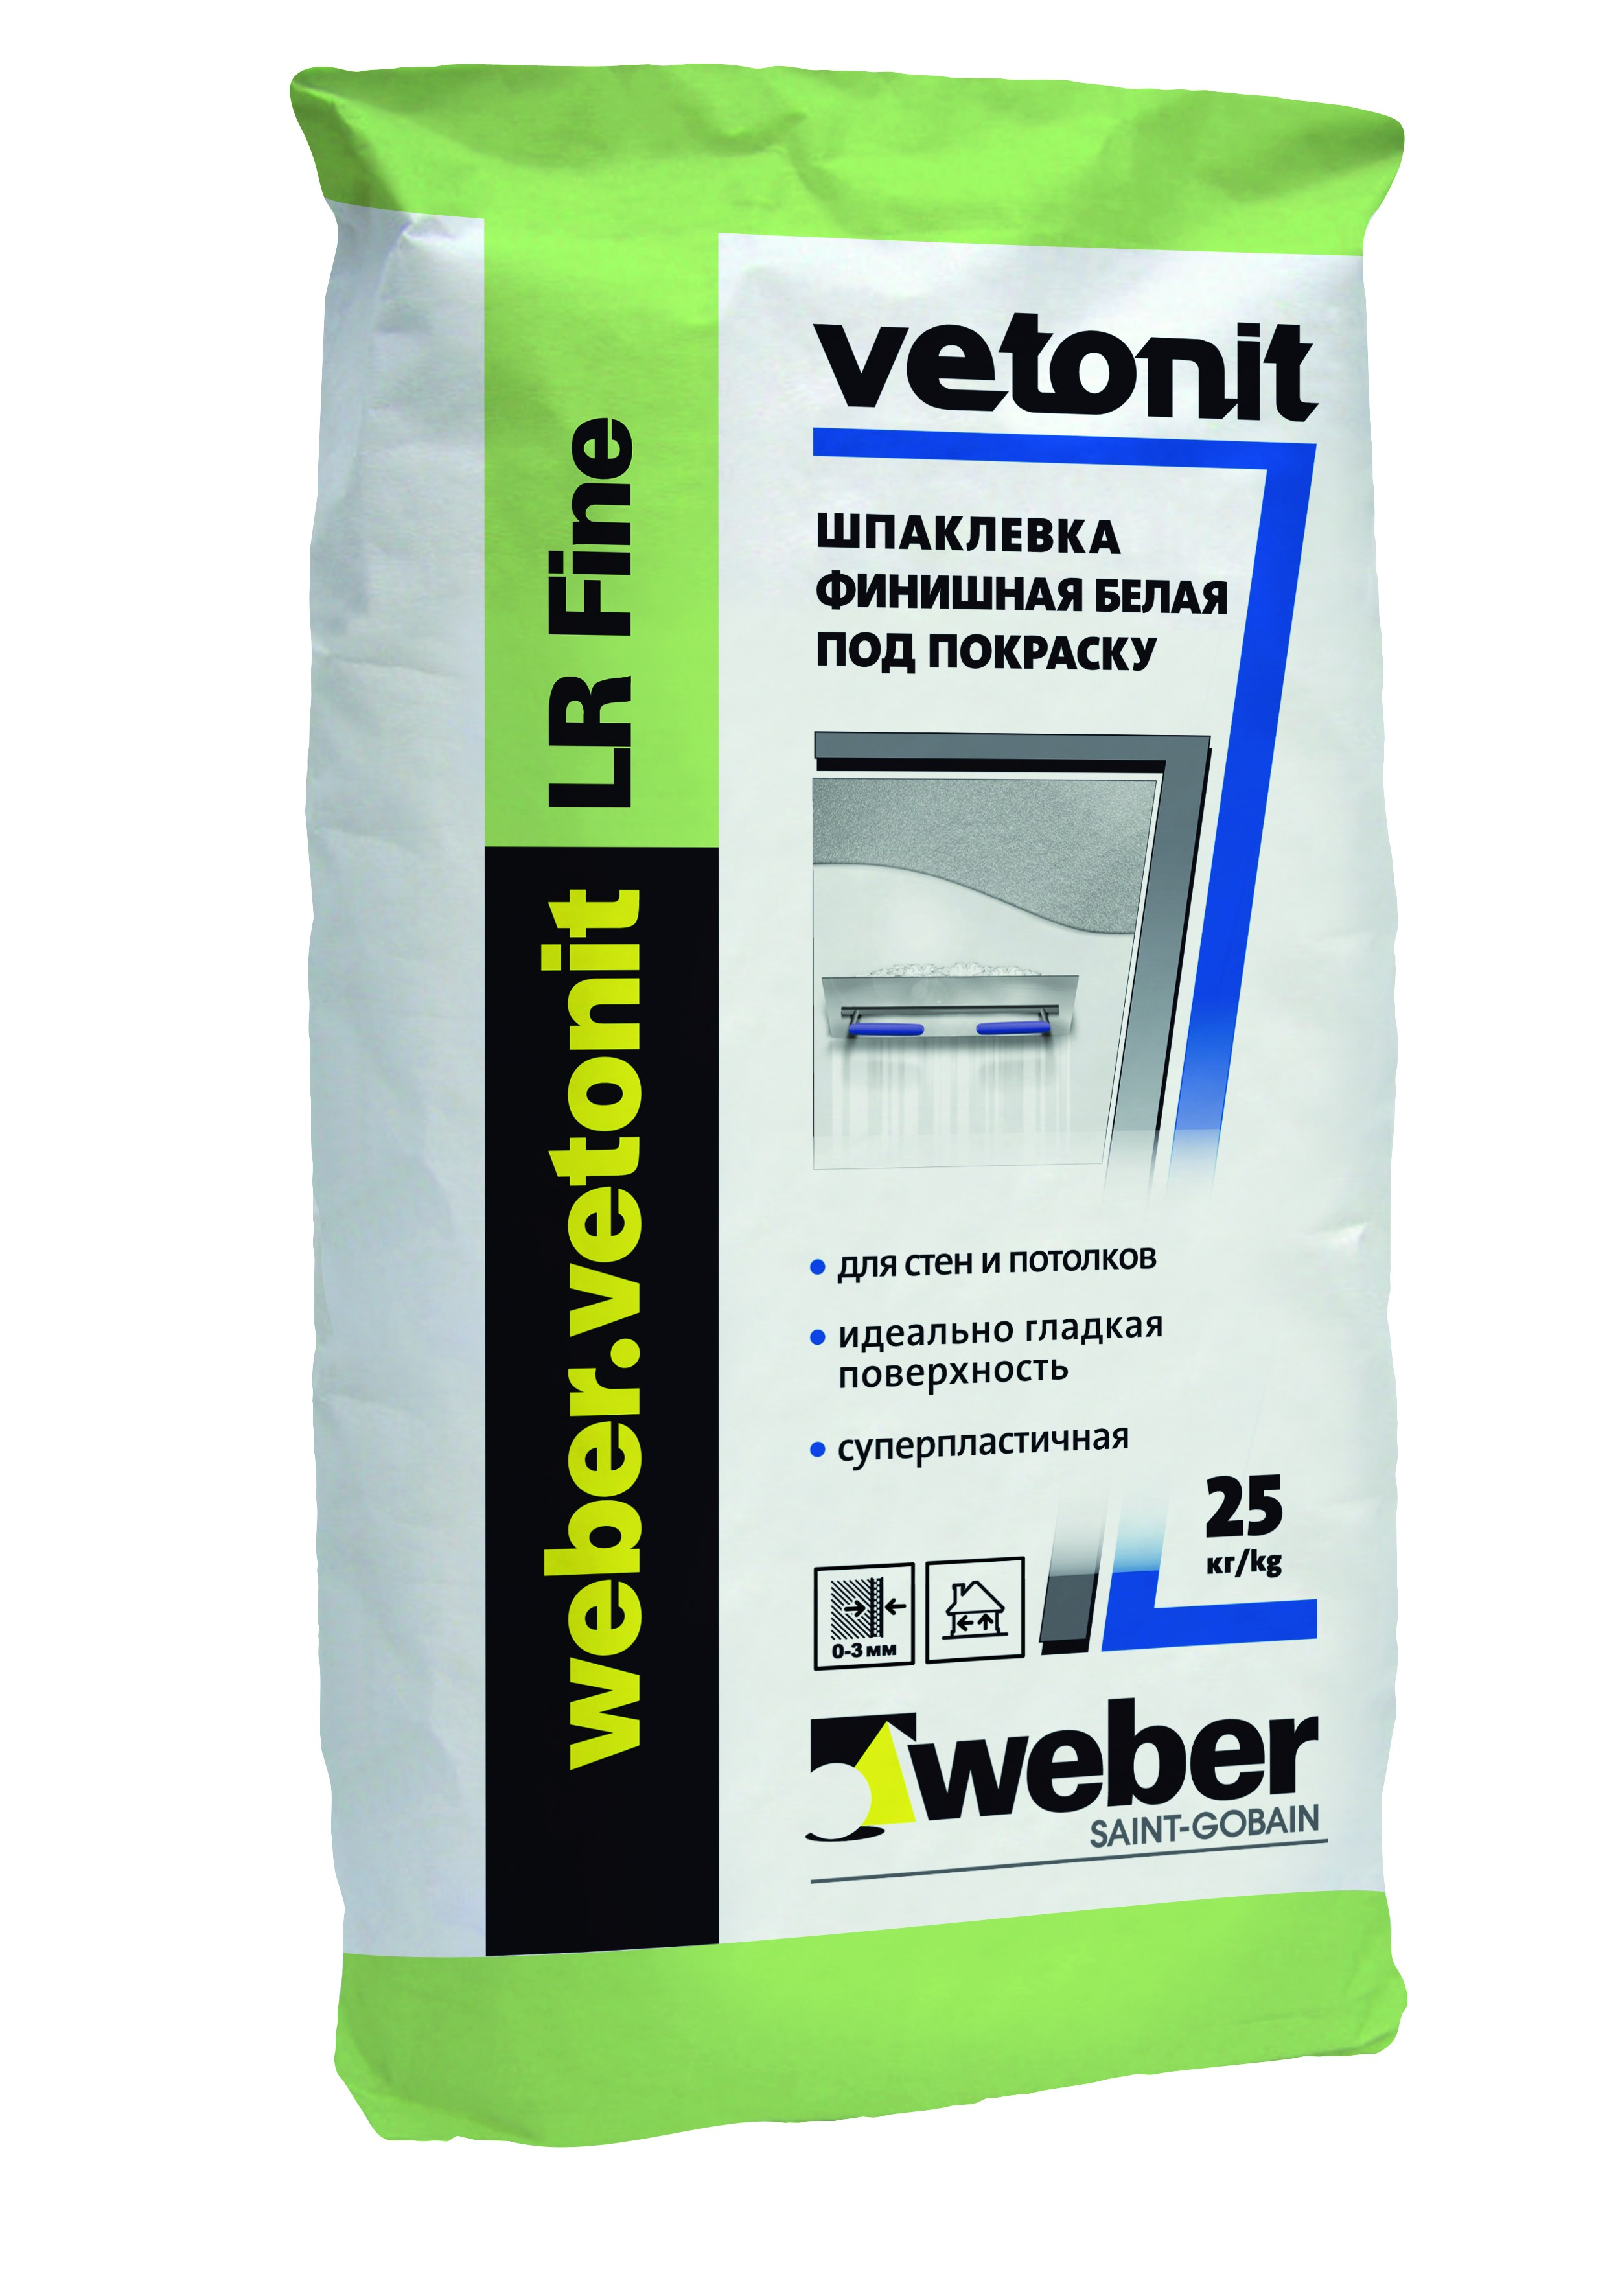 Ветонит ЛР Файн (Вебер.Ветонит) (белая шпаклевка для сухих помещений), 25кг